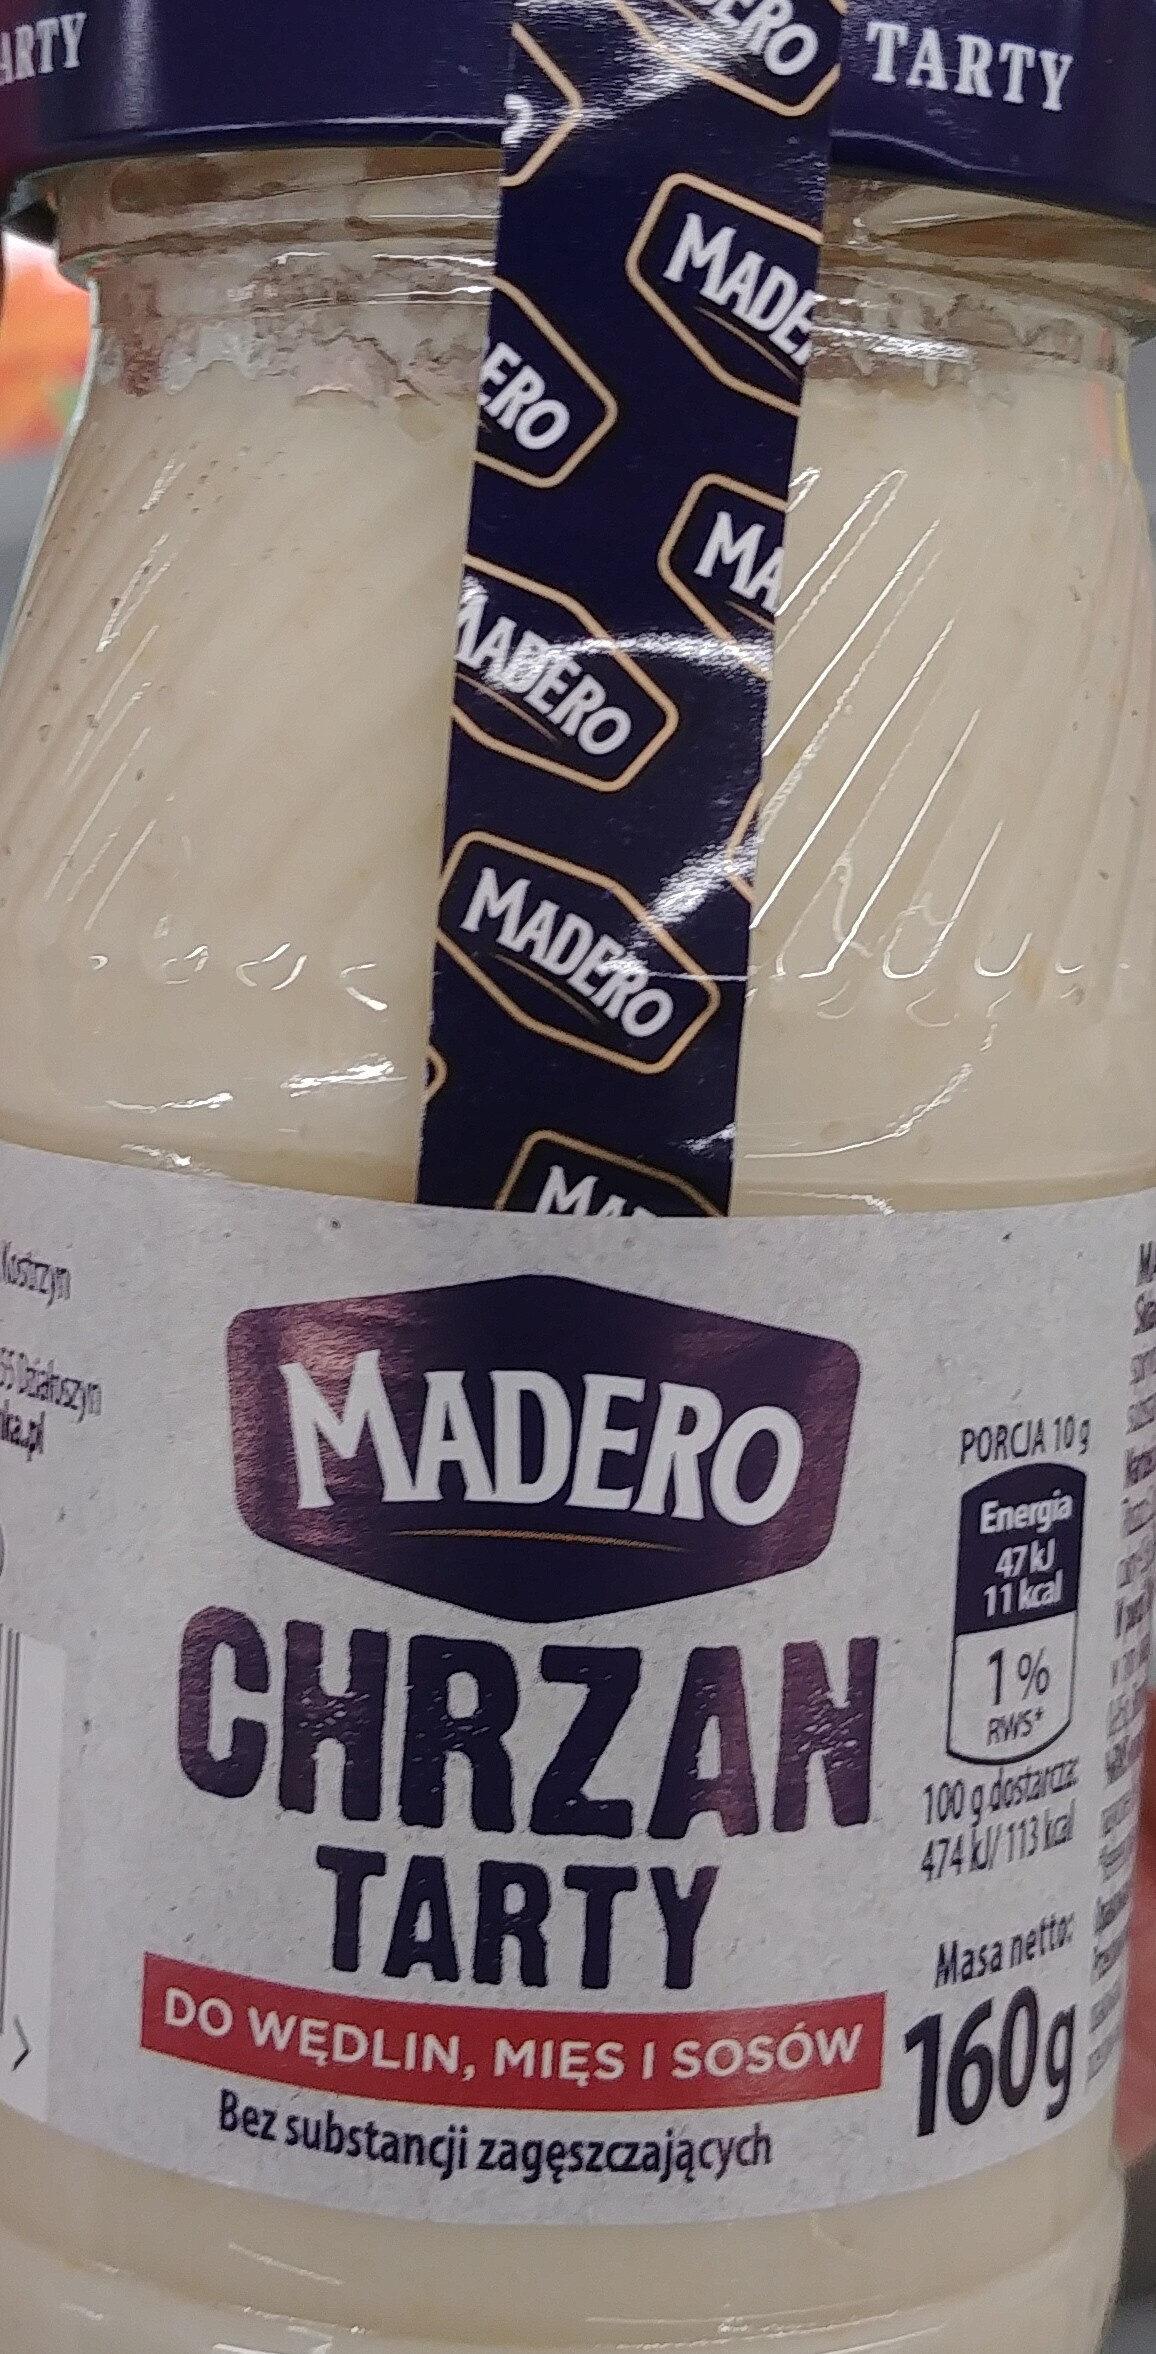 Chrzan tarty - Produkt - pl